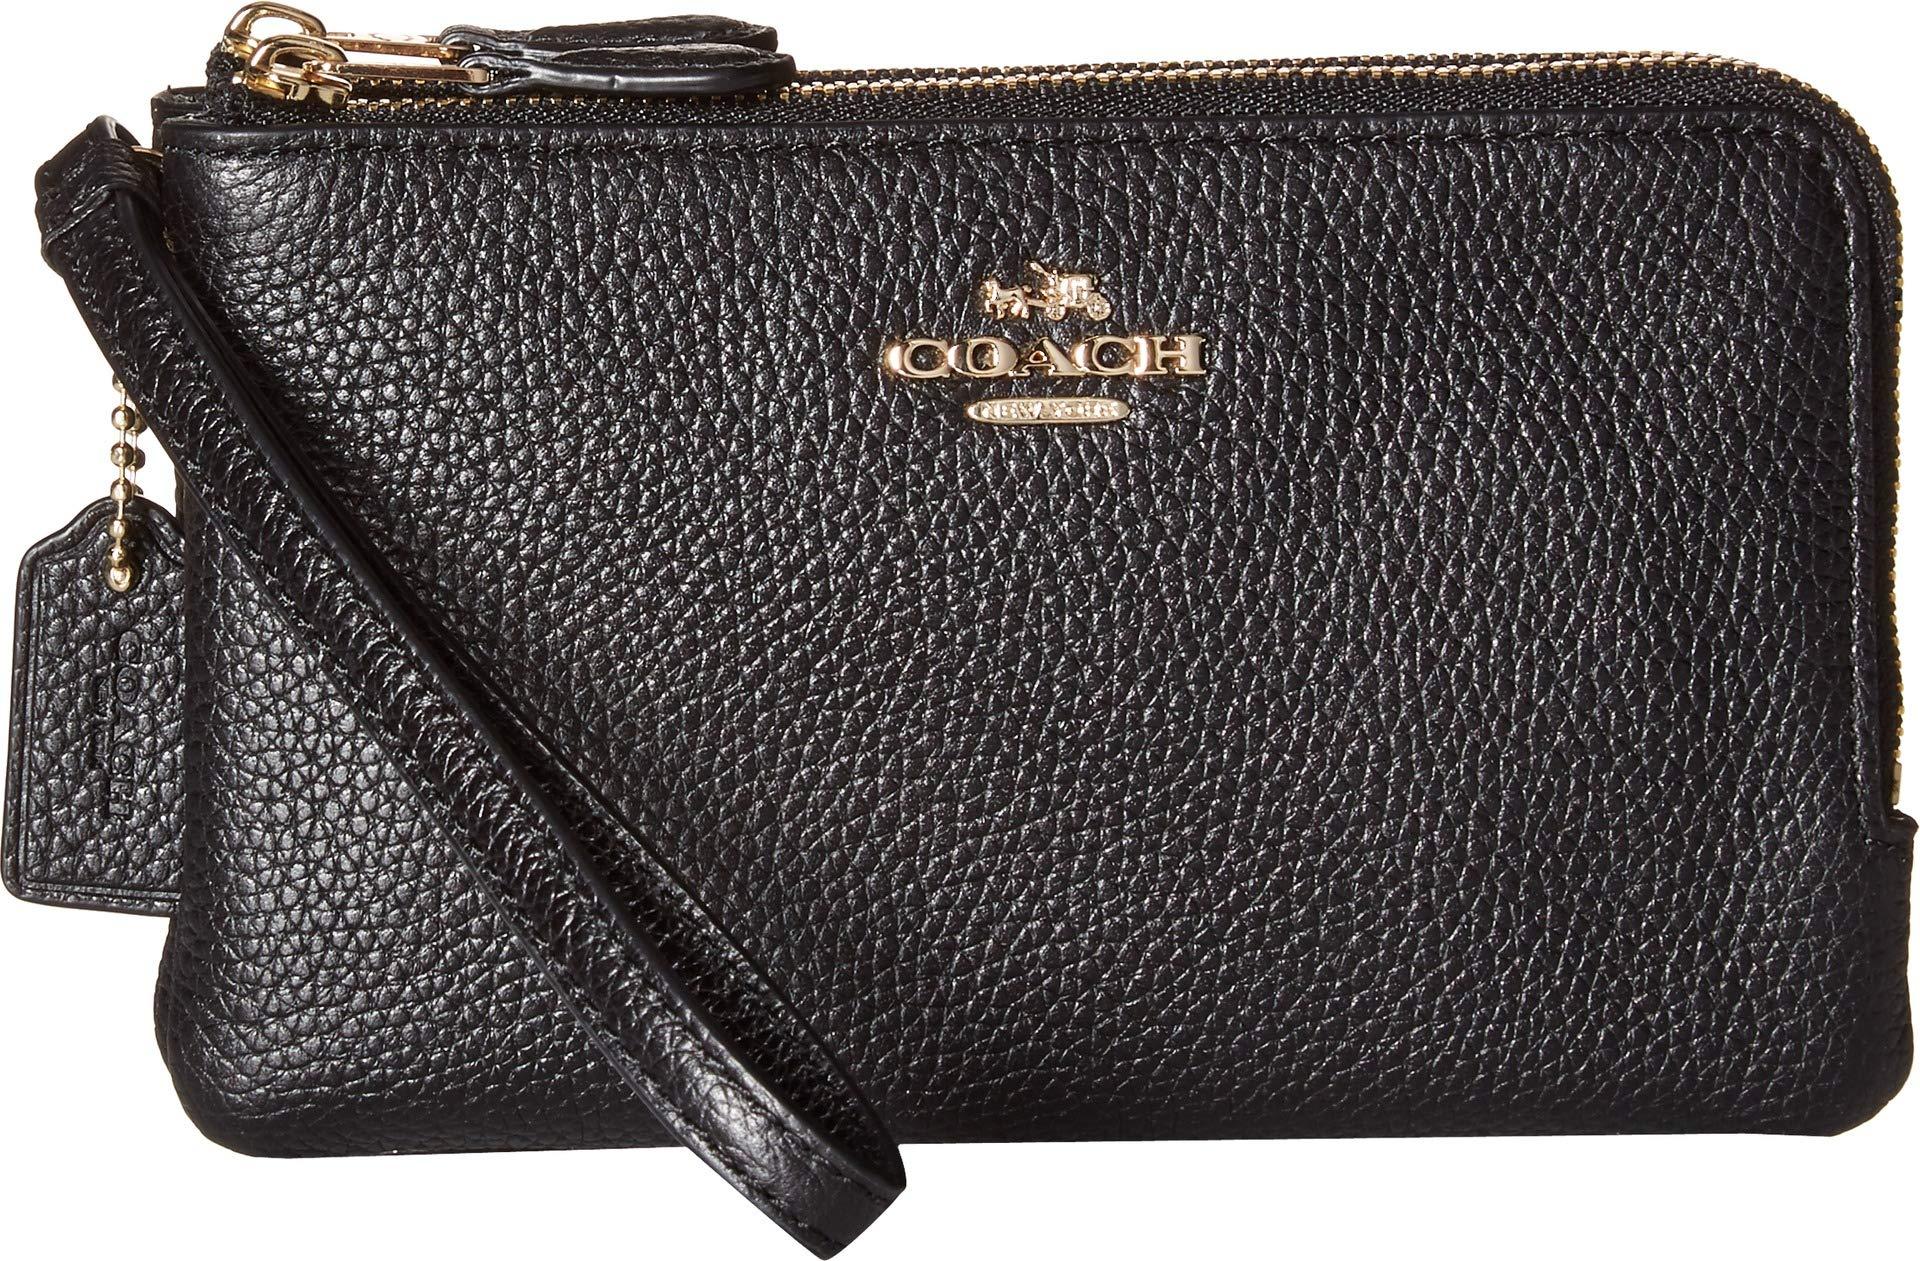 Coach Women's Polished Pebbled Leather Double Corner Zip Bag LI/Black Cell Phone Wallet